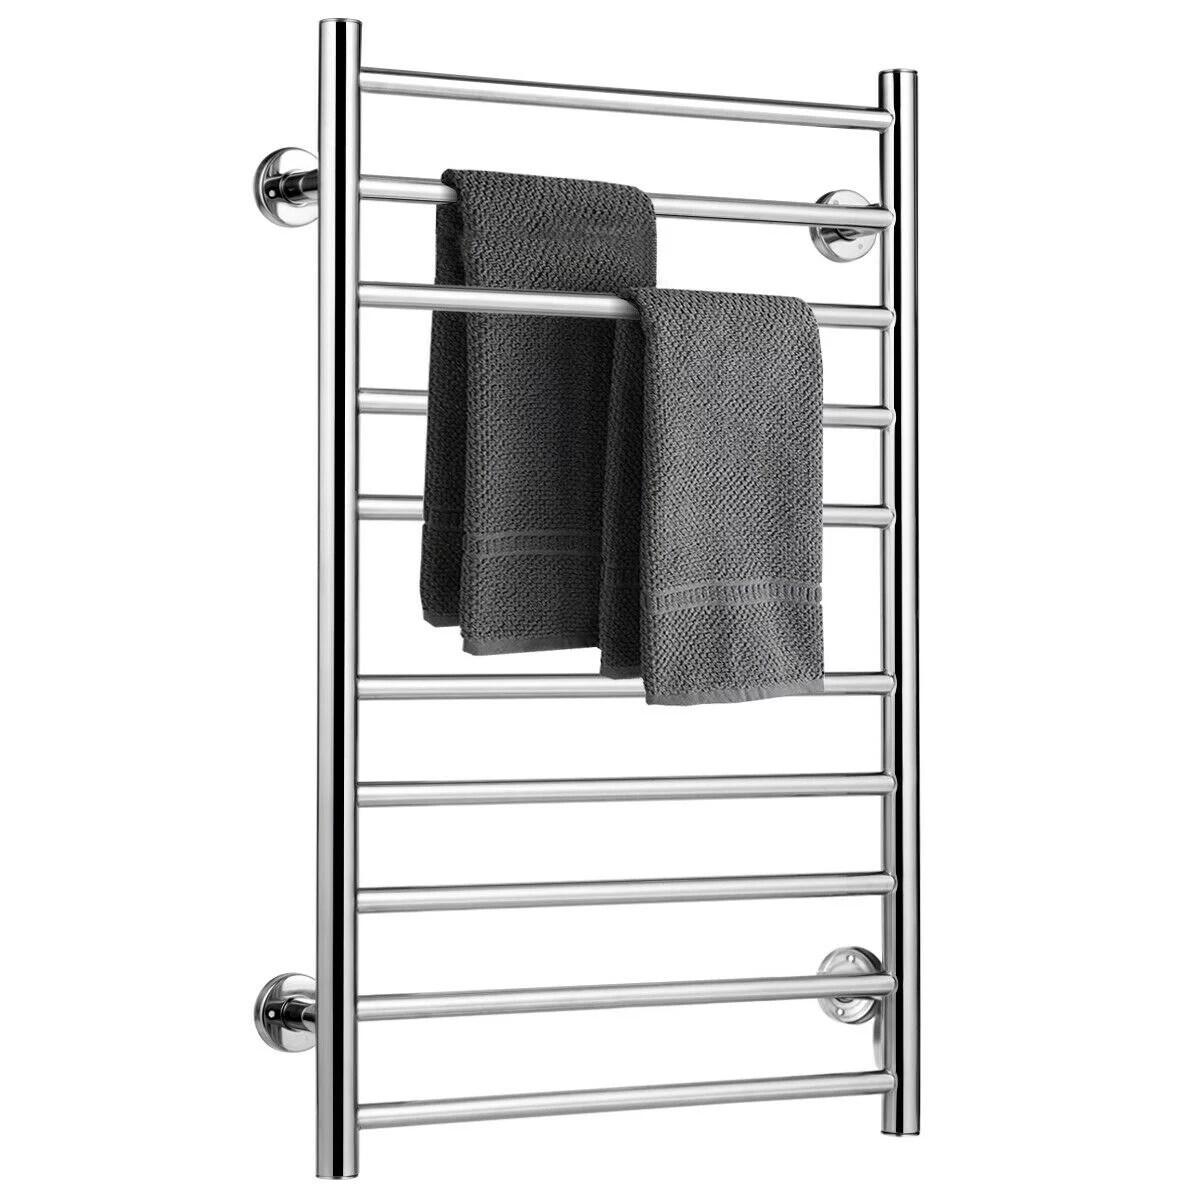 gymax stainless steel electric towel rail rack 10 bar rung heated bathroom warmer